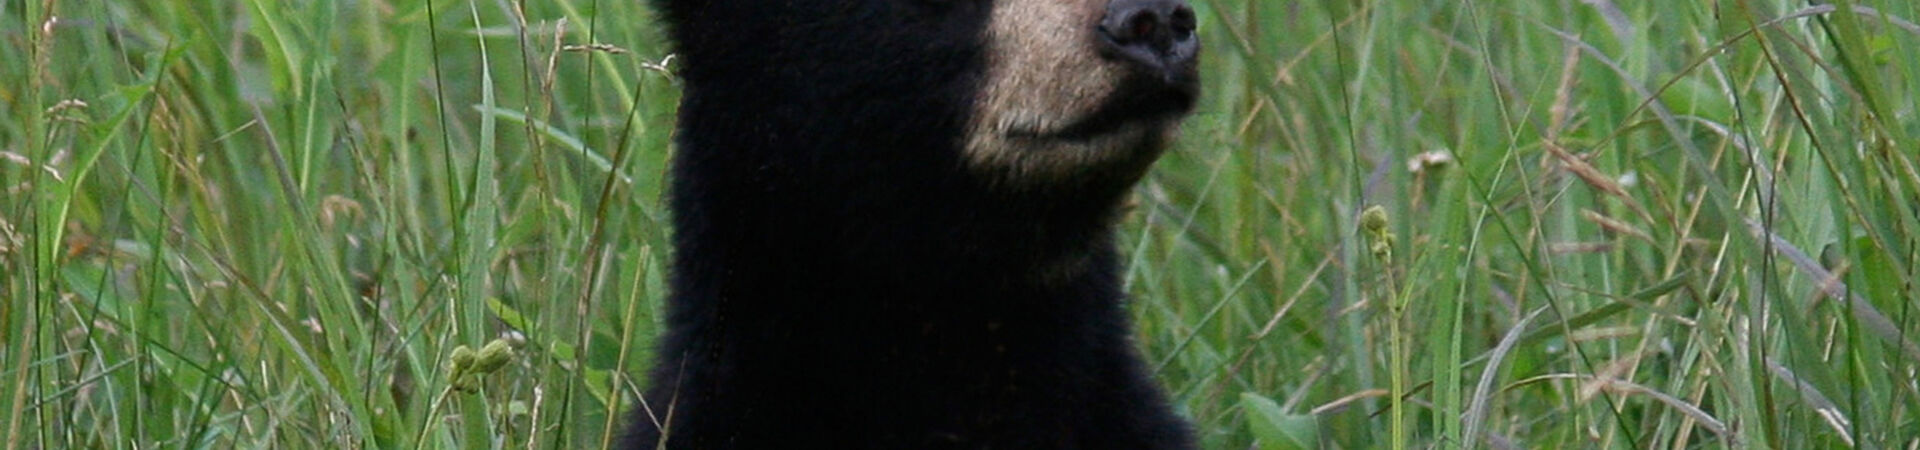 Banner - Stop The Florida Bear Hunt